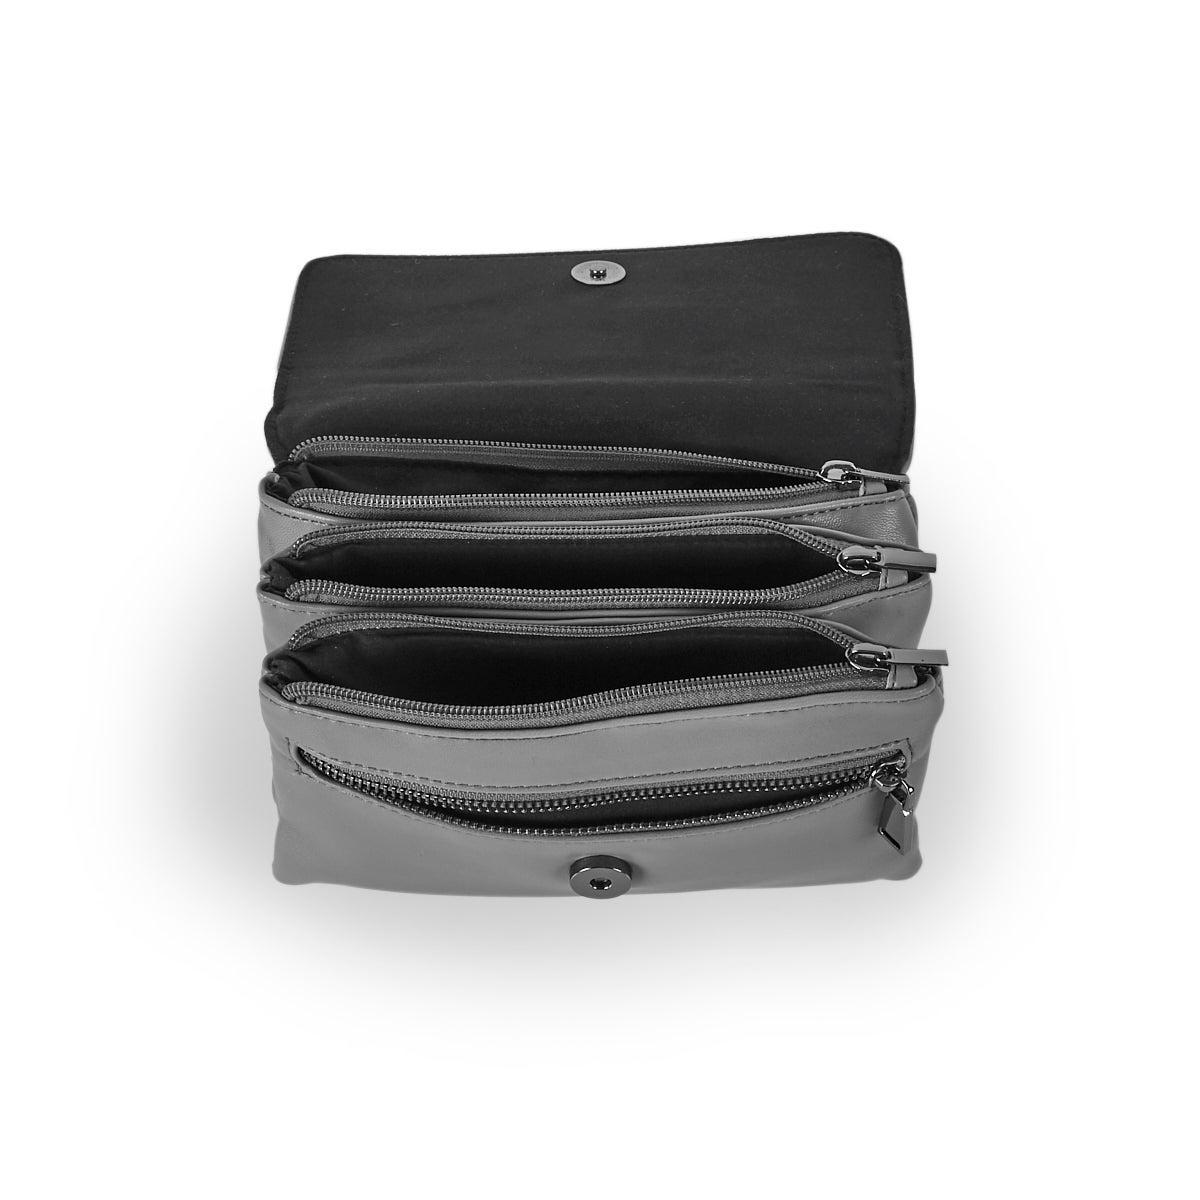 Lds Nappa Smalls grey crossbody bag